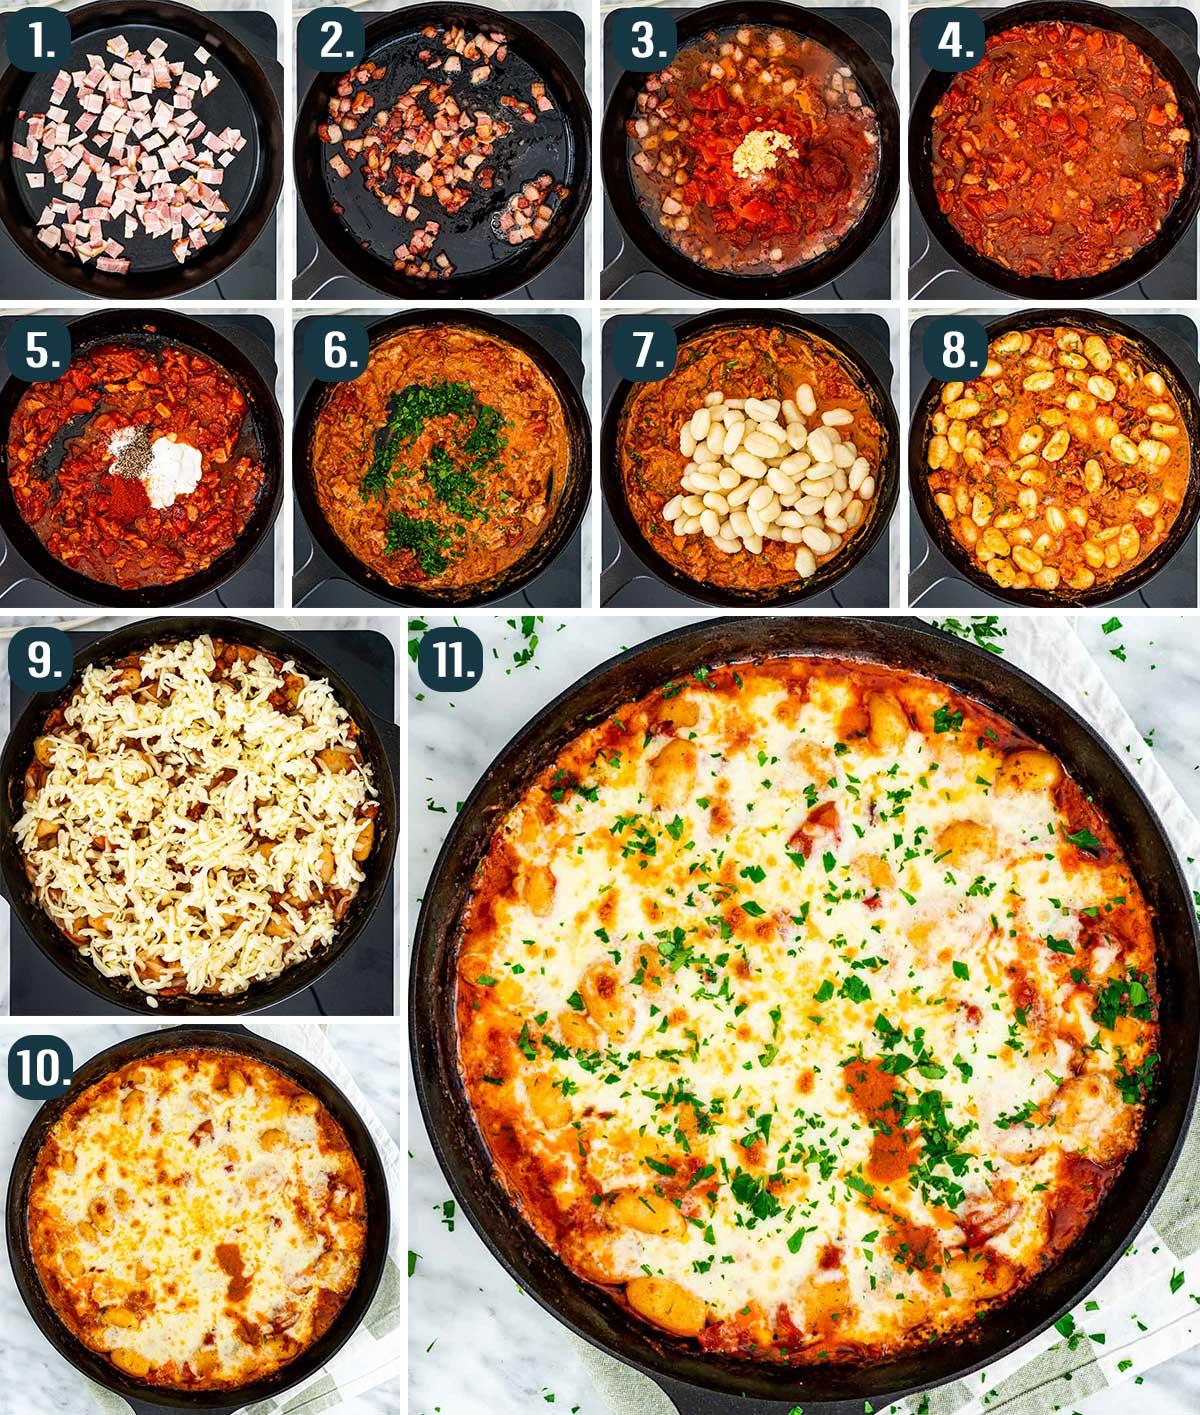 process shots showing how to make cheesy gnocchi bake